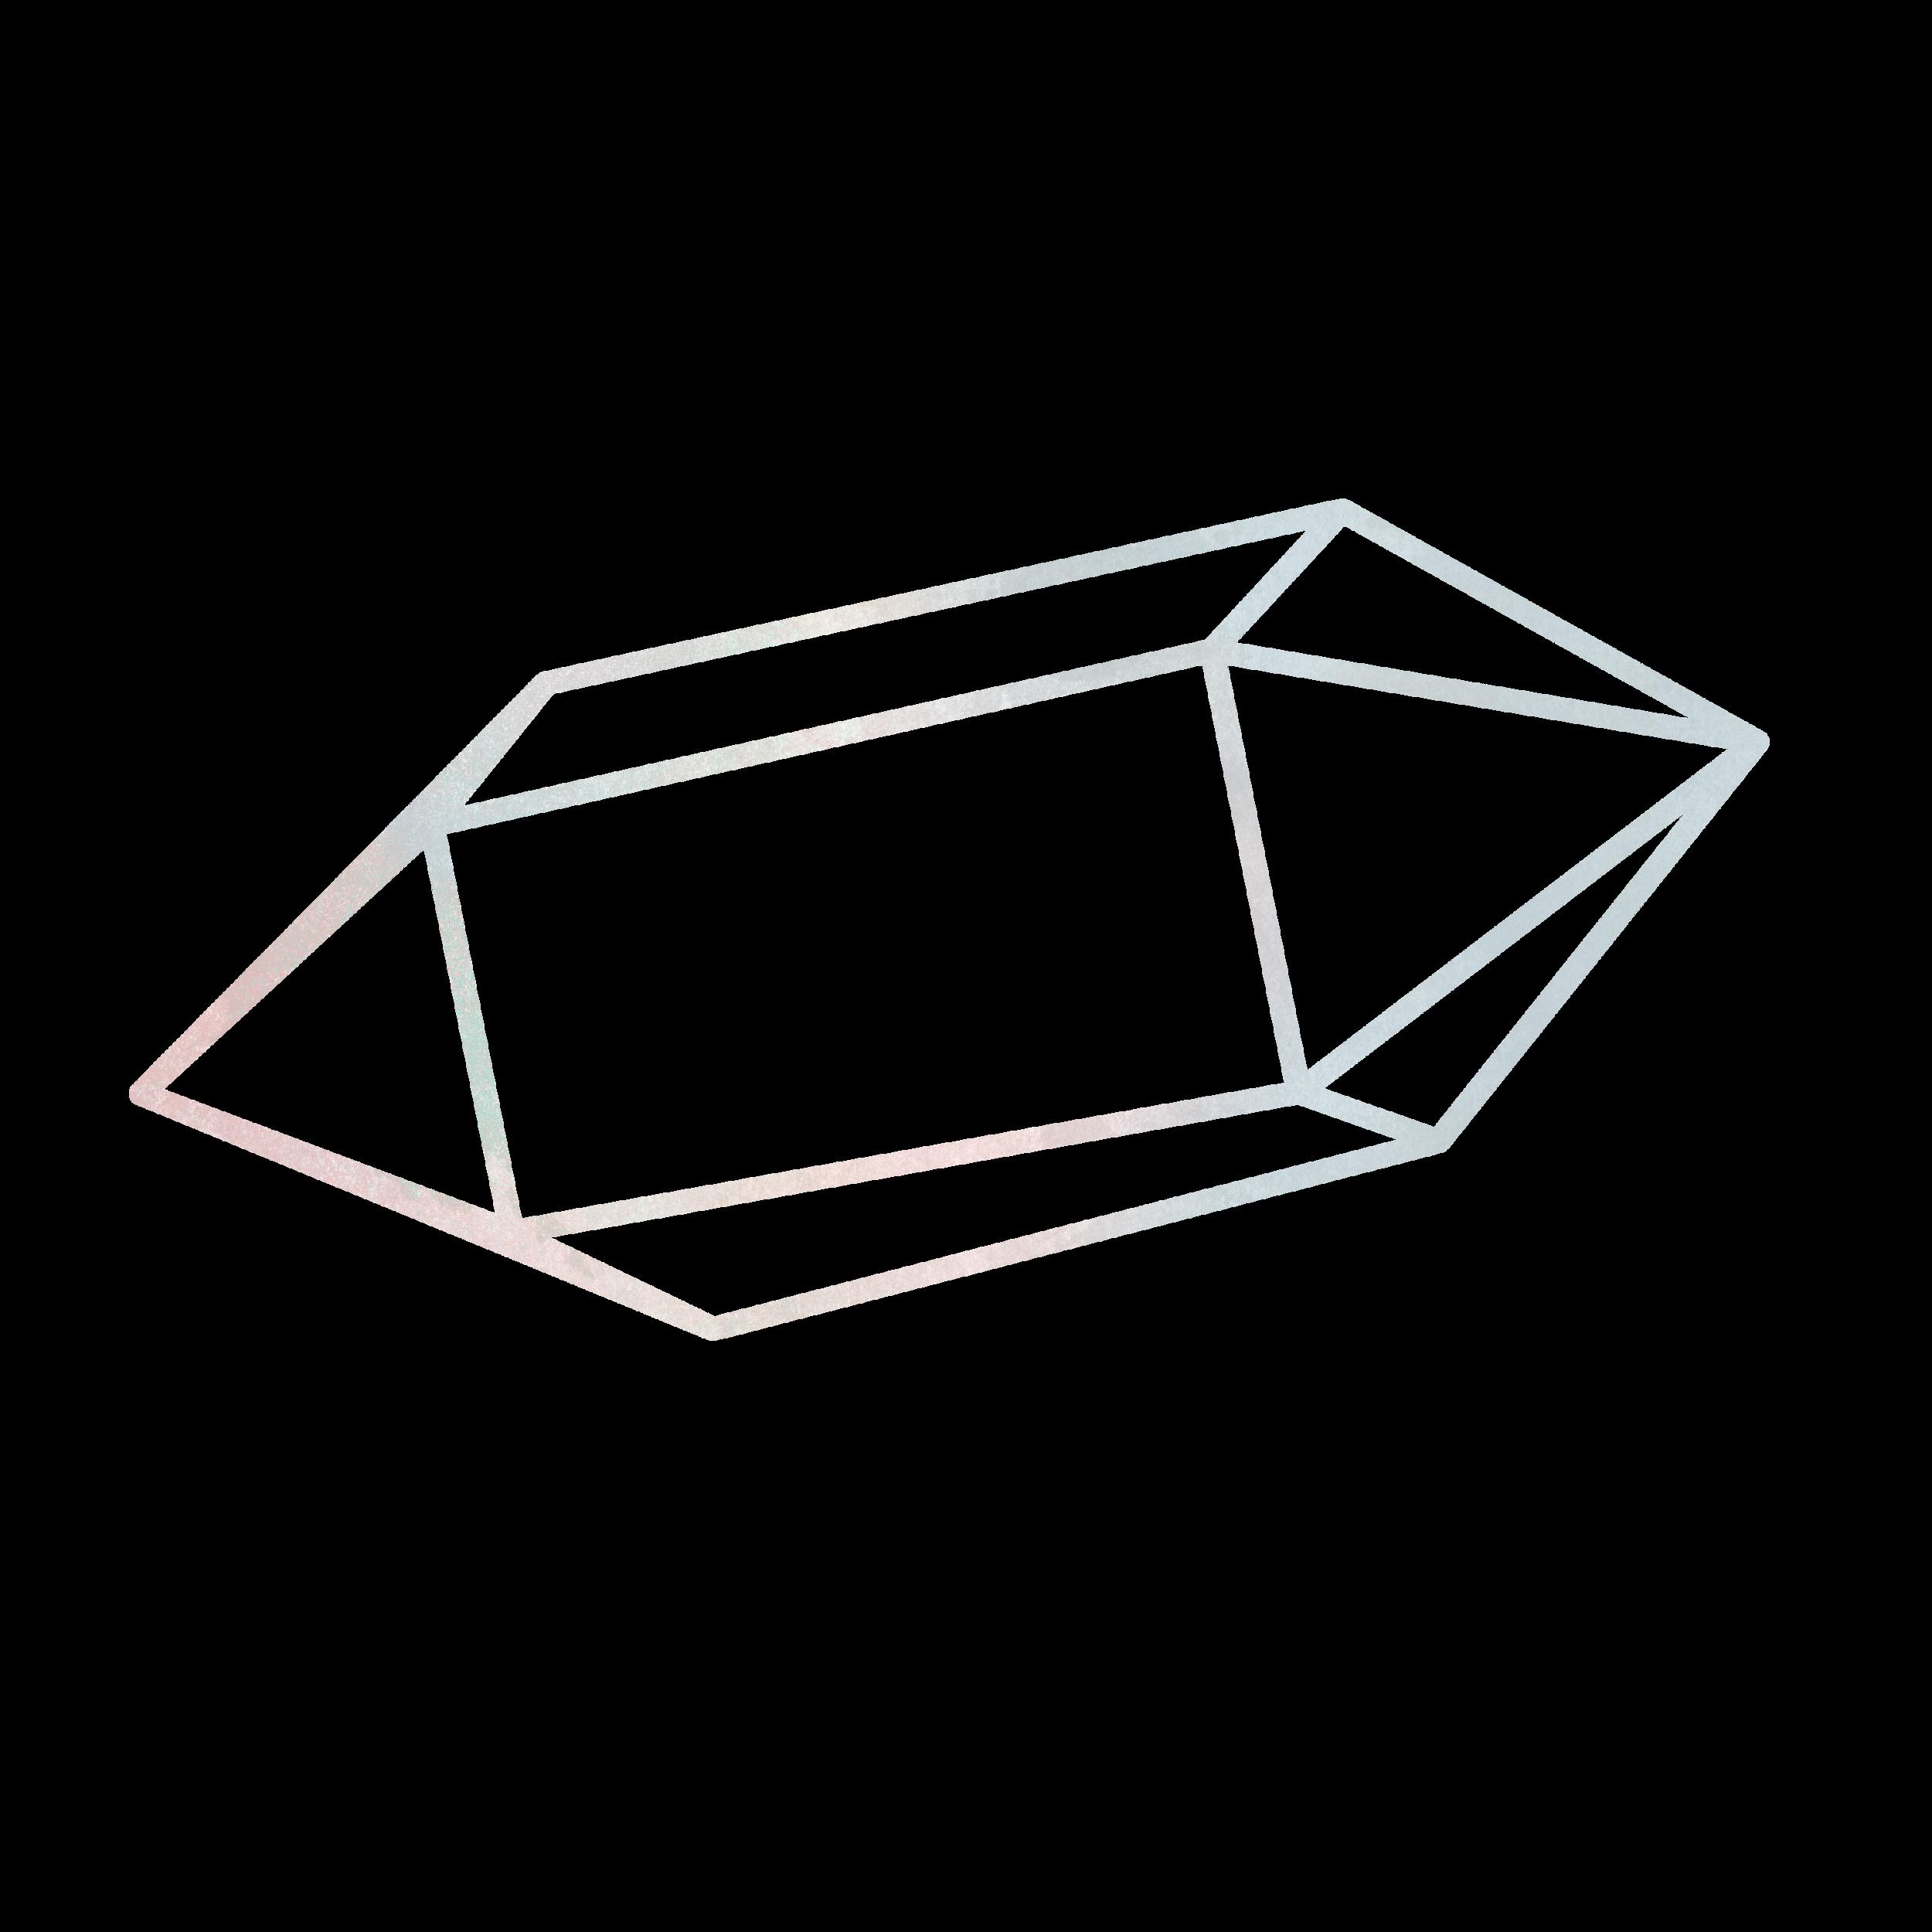 gemstone-4.png